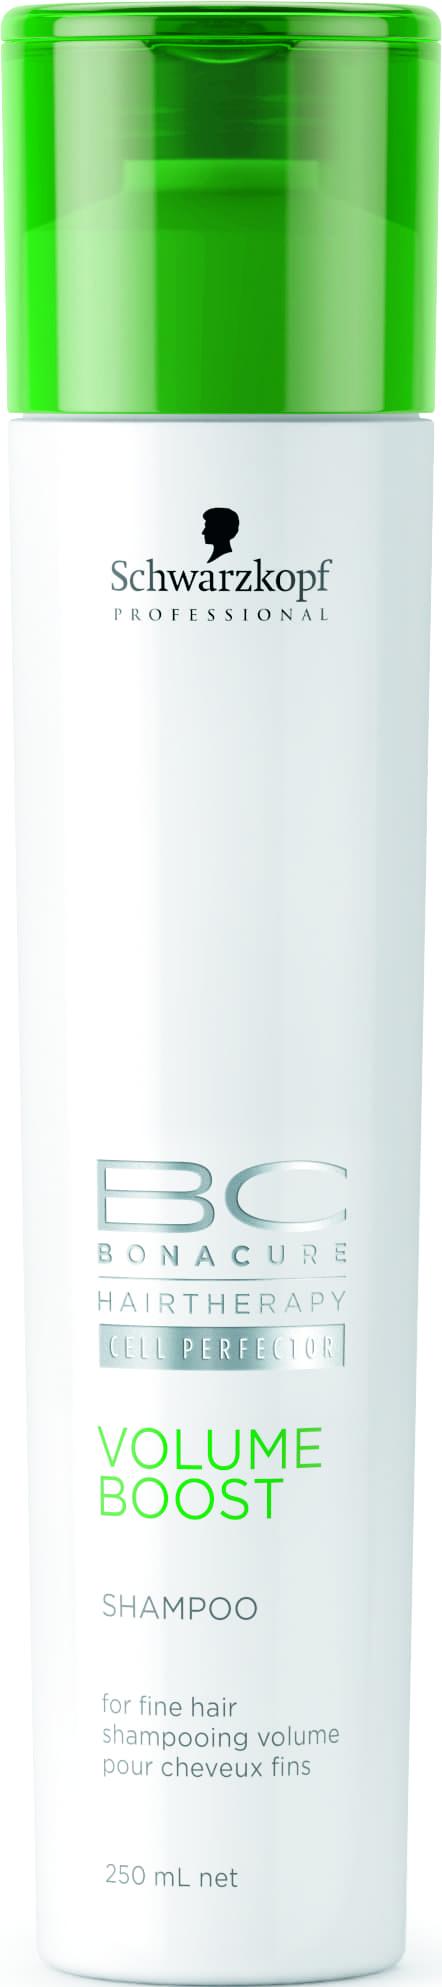 Shampoo Para Volume Bonacure Volume Boost (250ml) | Schwarzkopf Professional